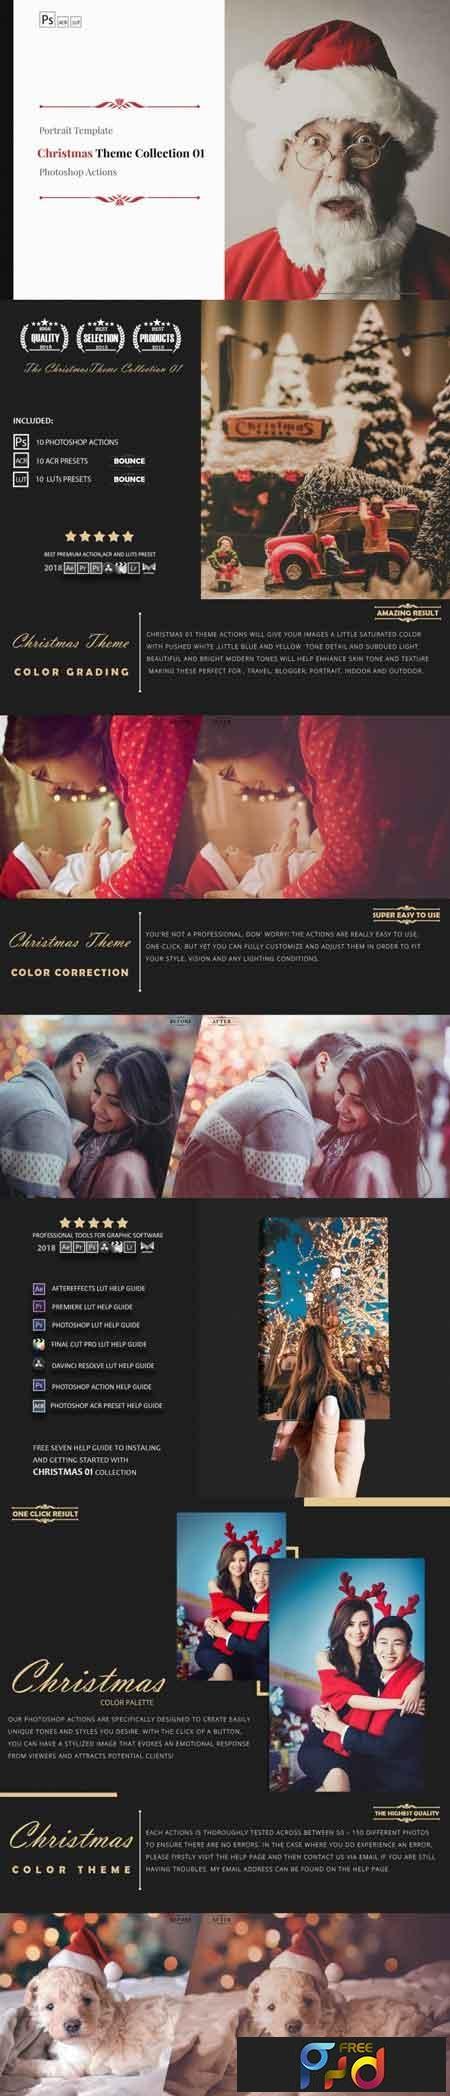 Christmas Theme Color Grading Collection 01 3509435 1